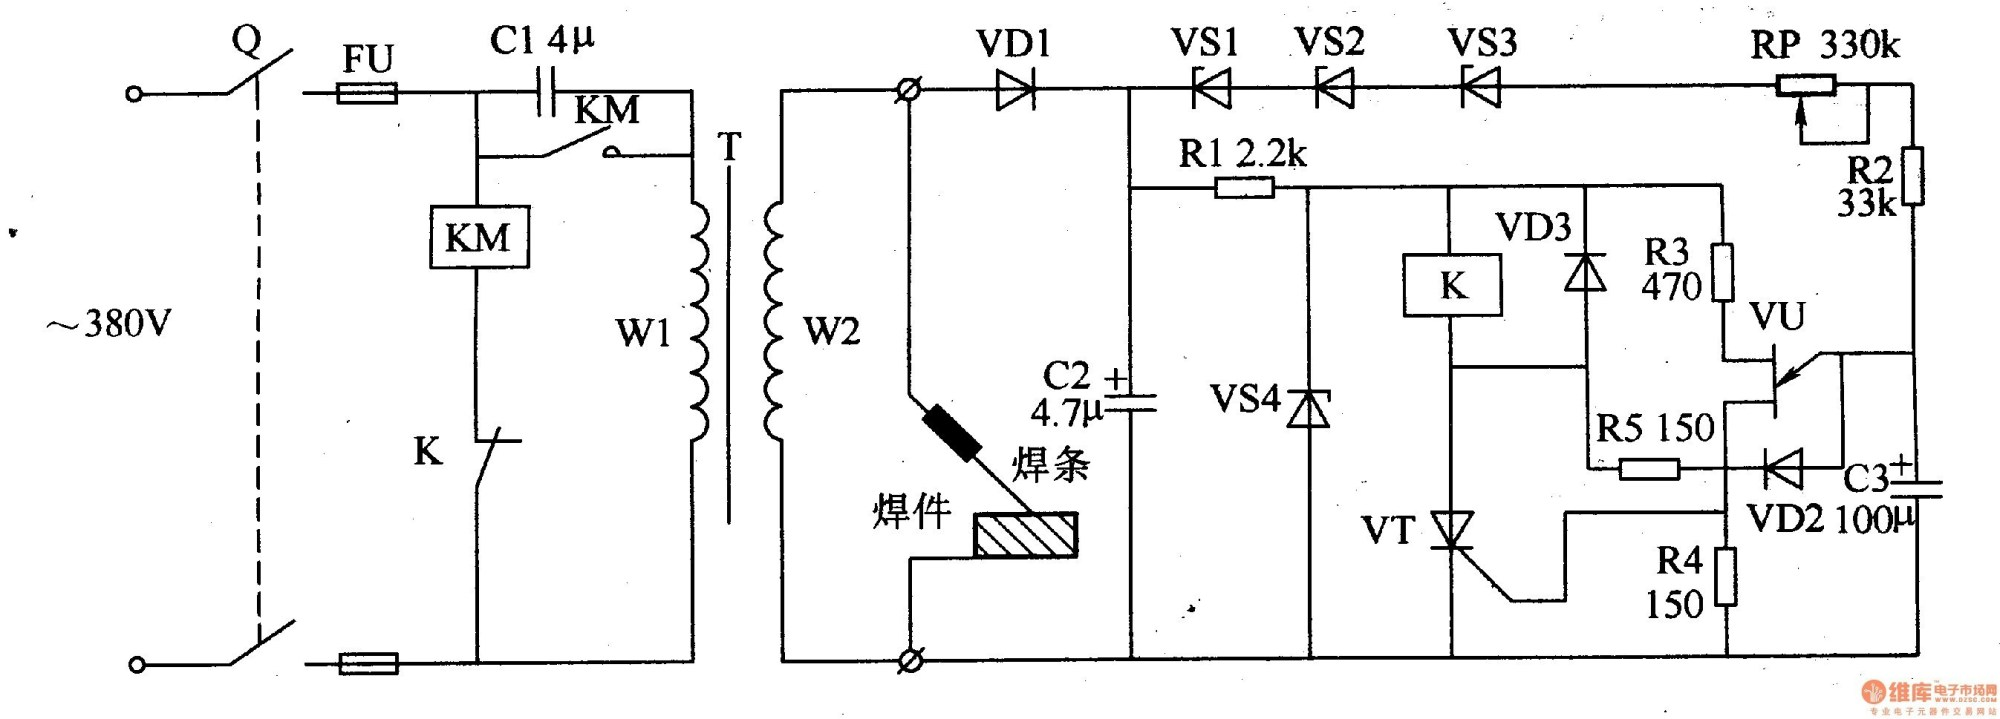 hight resolution of raymond wiring diagram data wiring diagramraymond wiring diagram wiring diagram week raymond wiring diagram